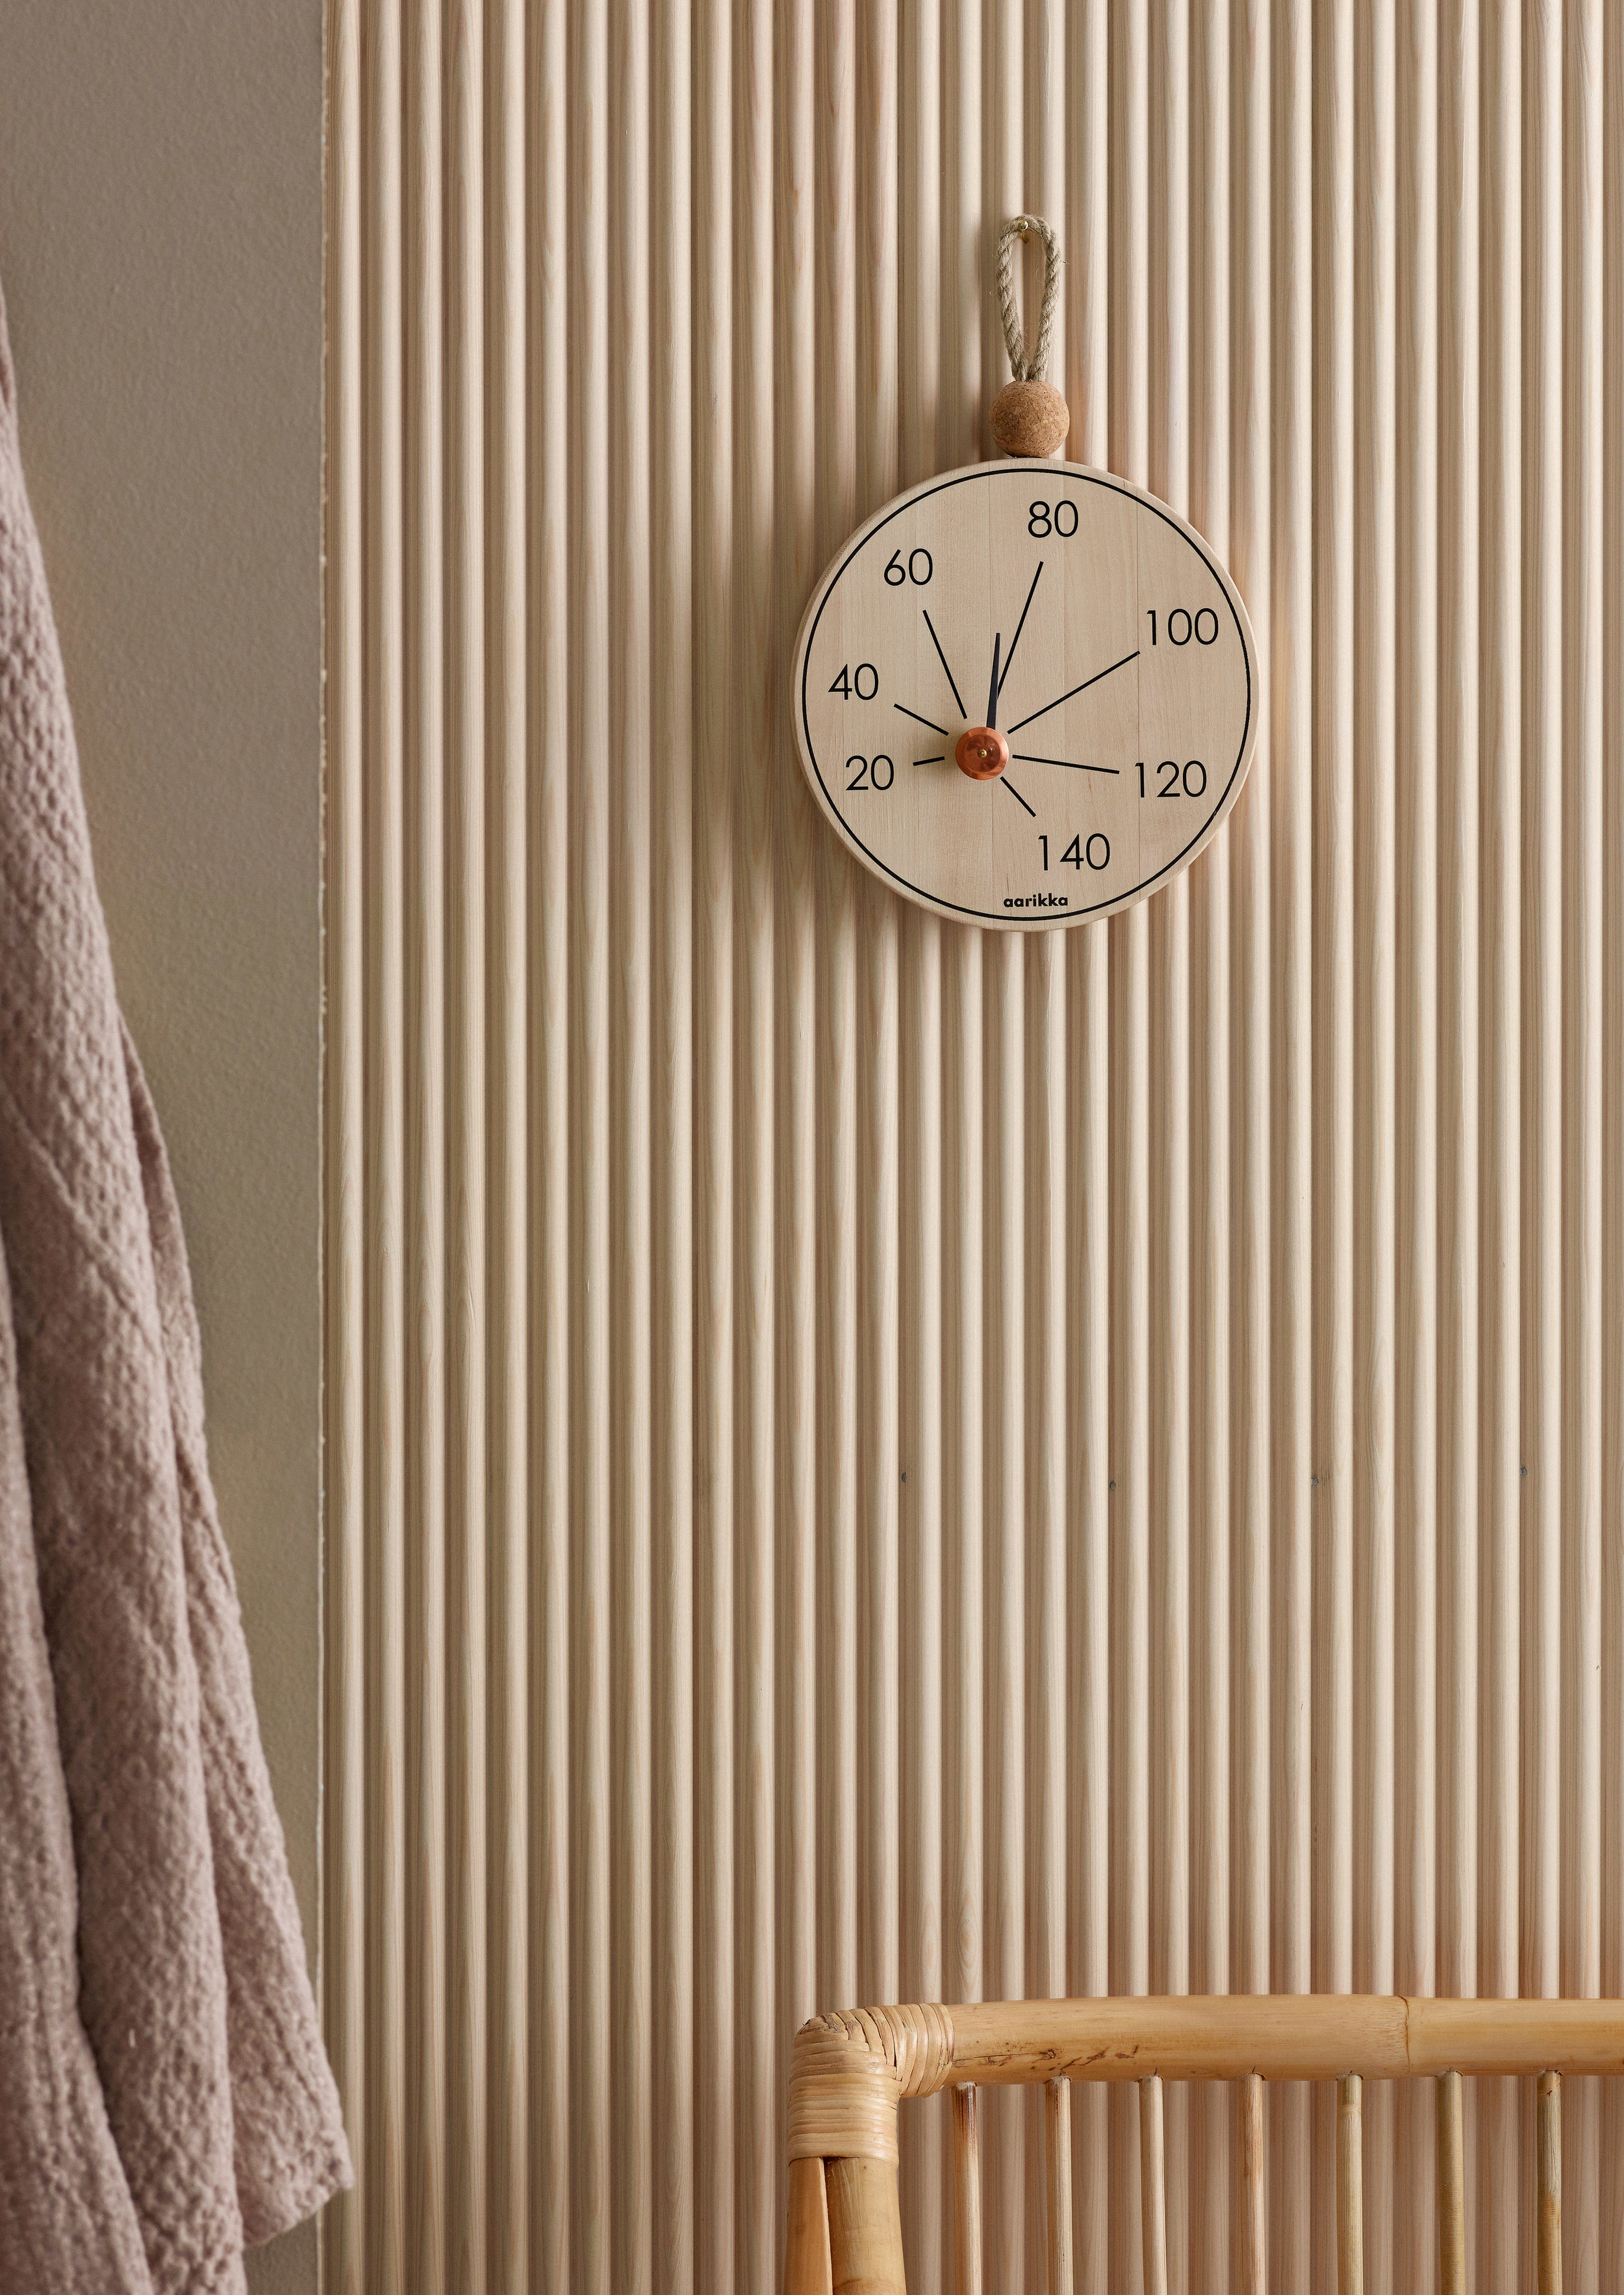 Saimaa_sauna_thermometer_nettireso.jpg